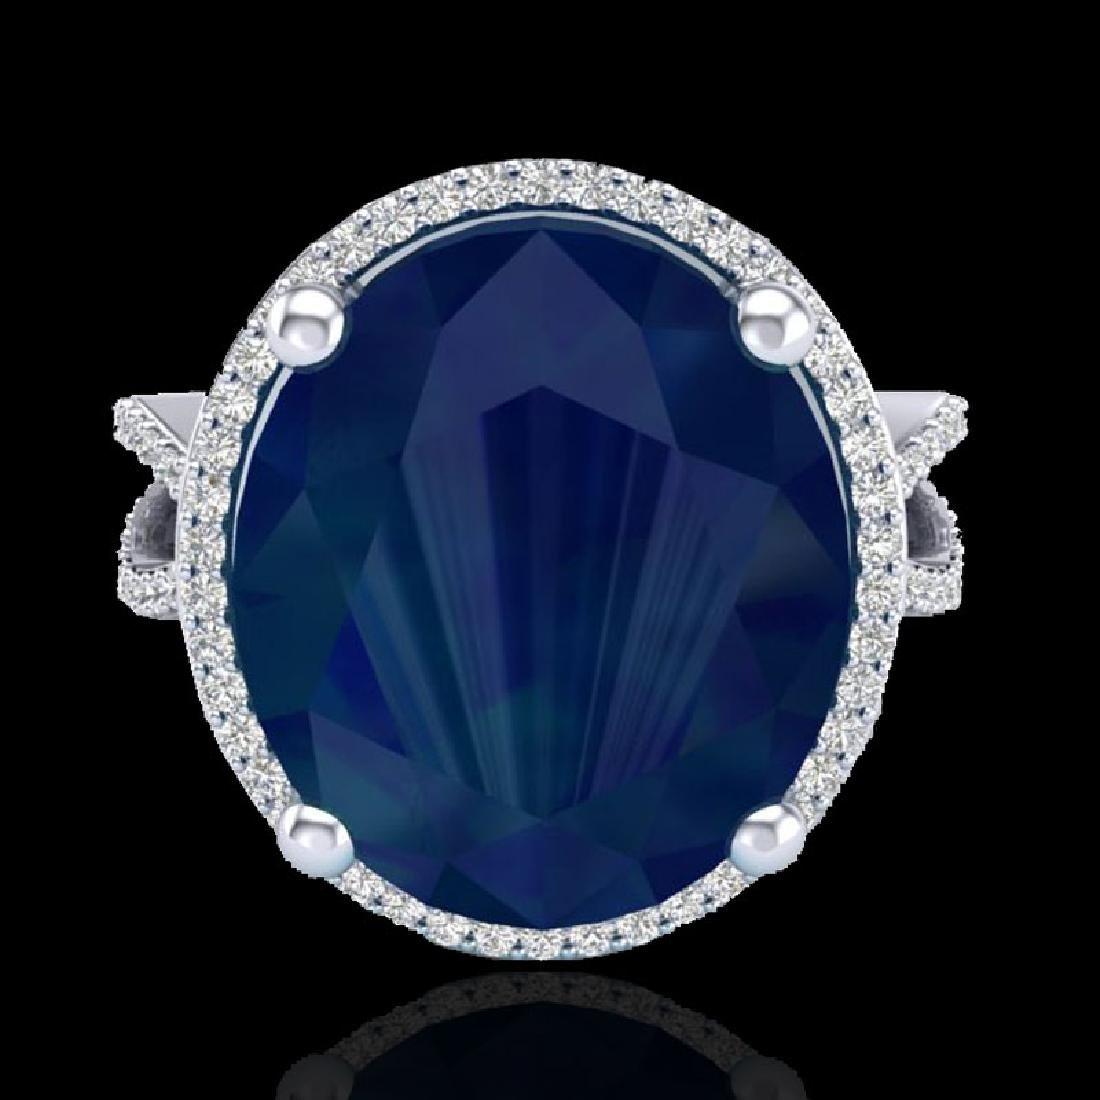 12 CTW Sapphire & Micro Pave VS/SI Diamond Halo Ring